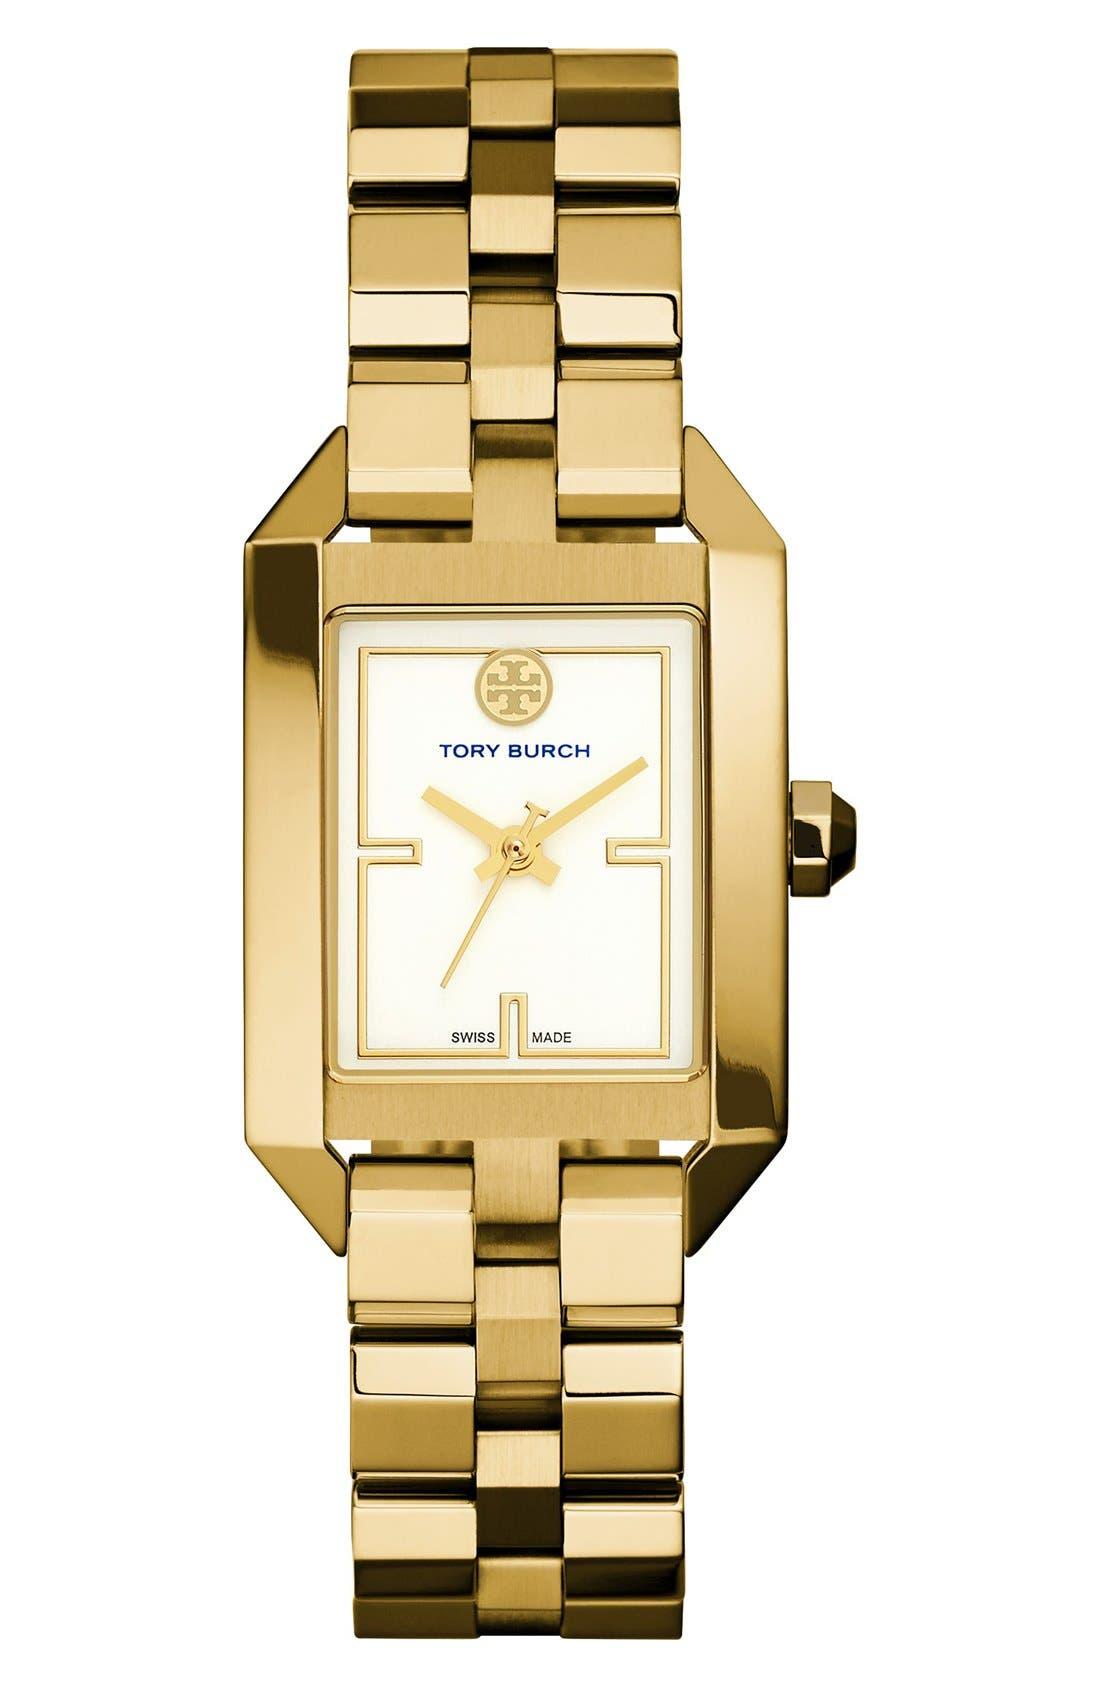 Main Image - Tory Burch 'Dalloway' Bracelet Watch, 23mm x 35mm